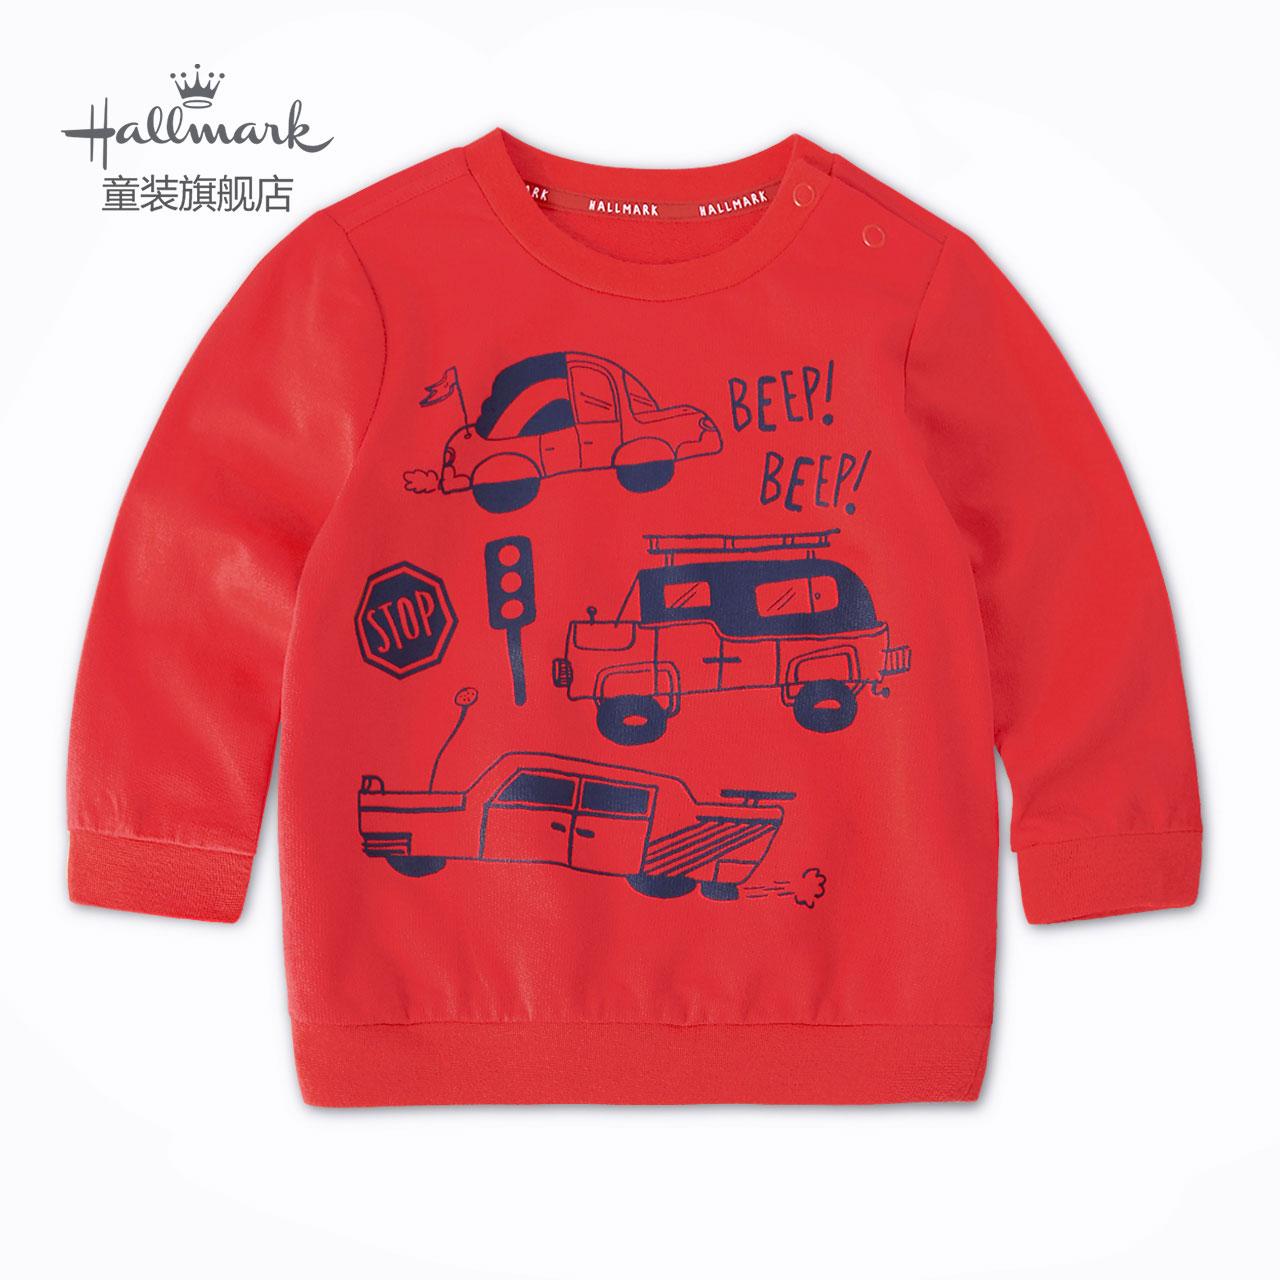 Hallmark贺曼纯棉2020春秋新款童装儿童幼童潮装男童长袖卫衣上衣